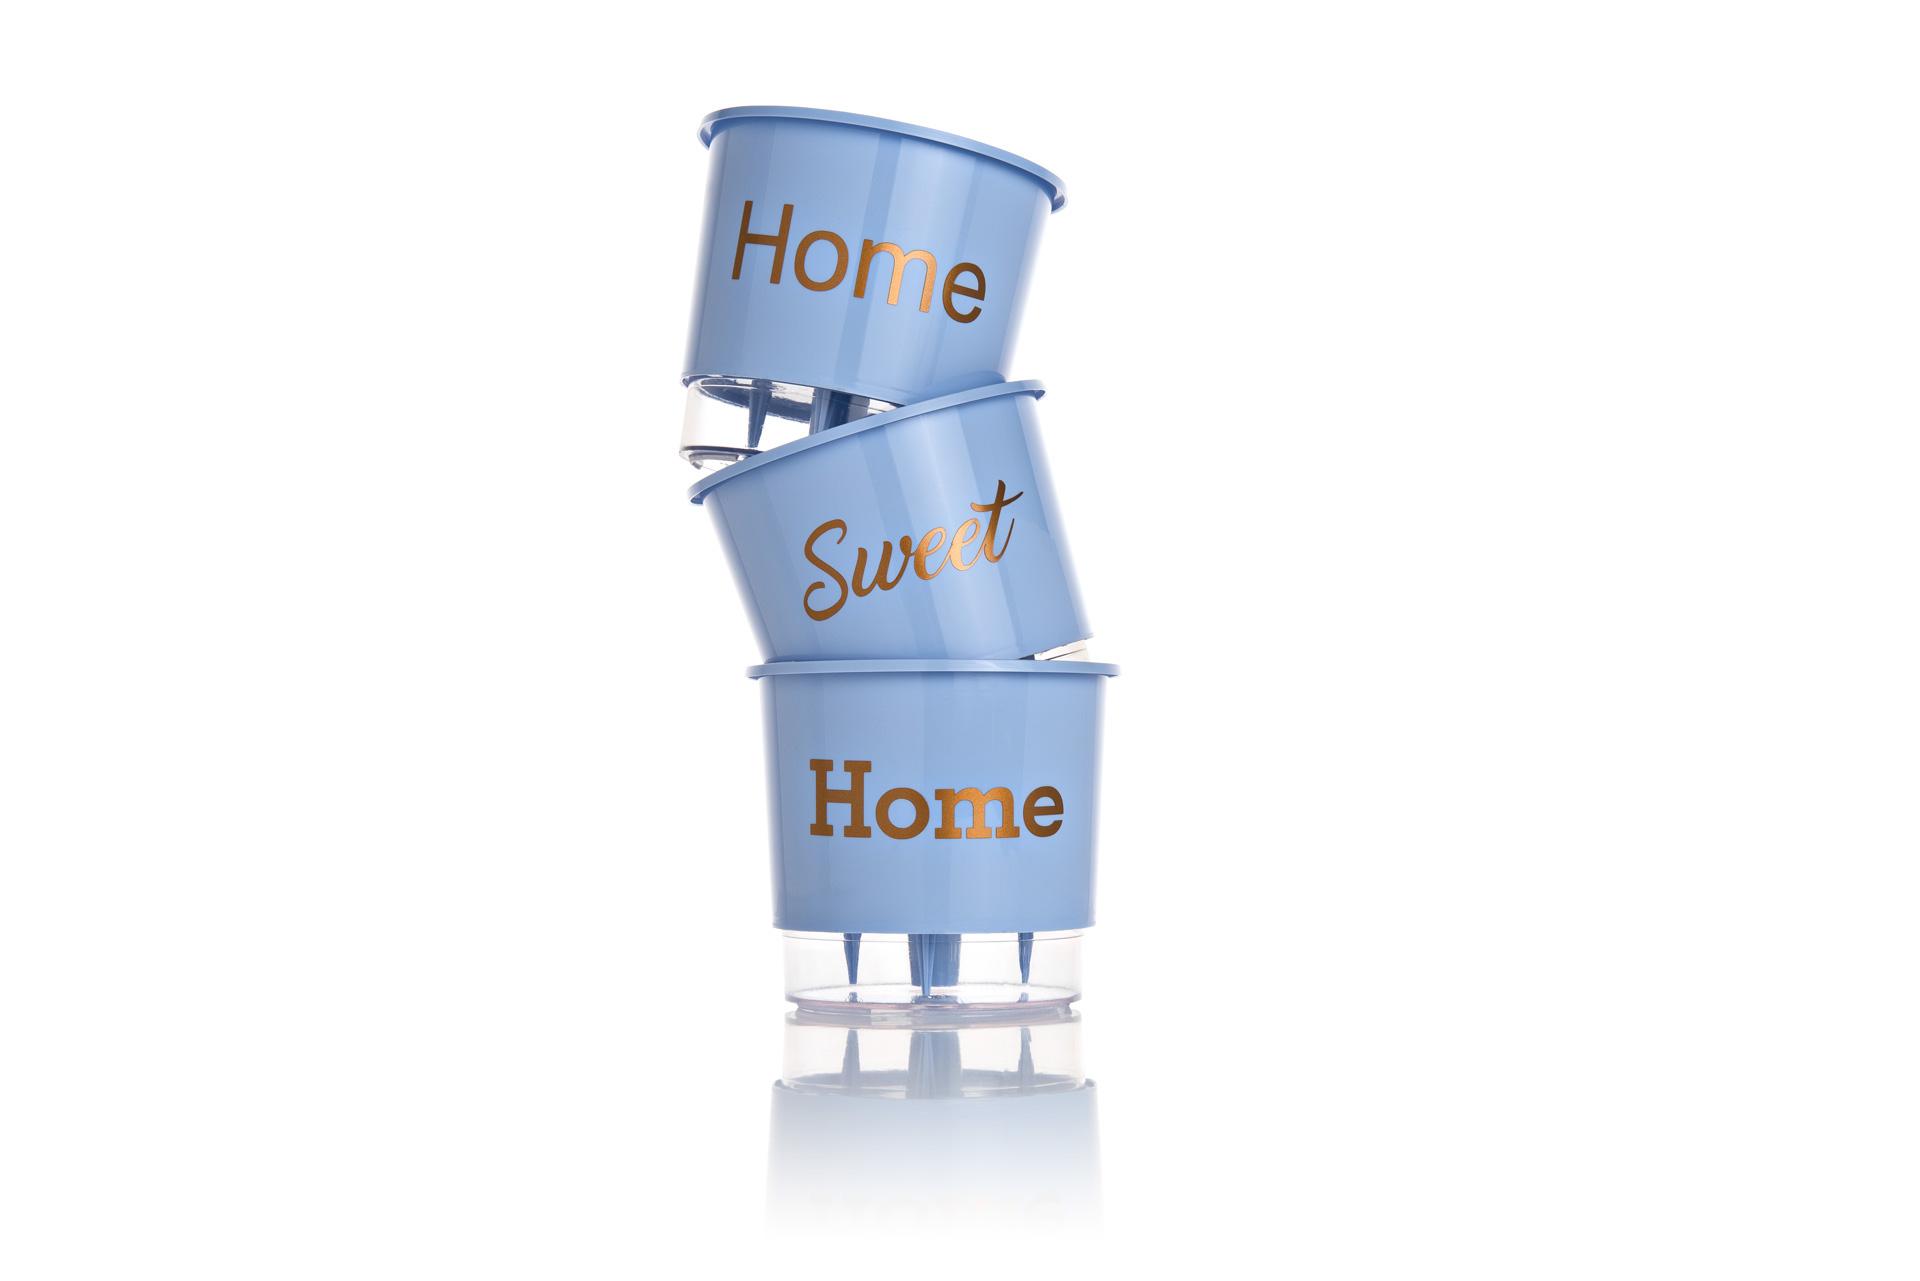 Conjunto 3 Vasos Autoirrigáveis Azul Serenity Pequenos 12cm x 11cm Home Sweet Home  - Loja Raiz